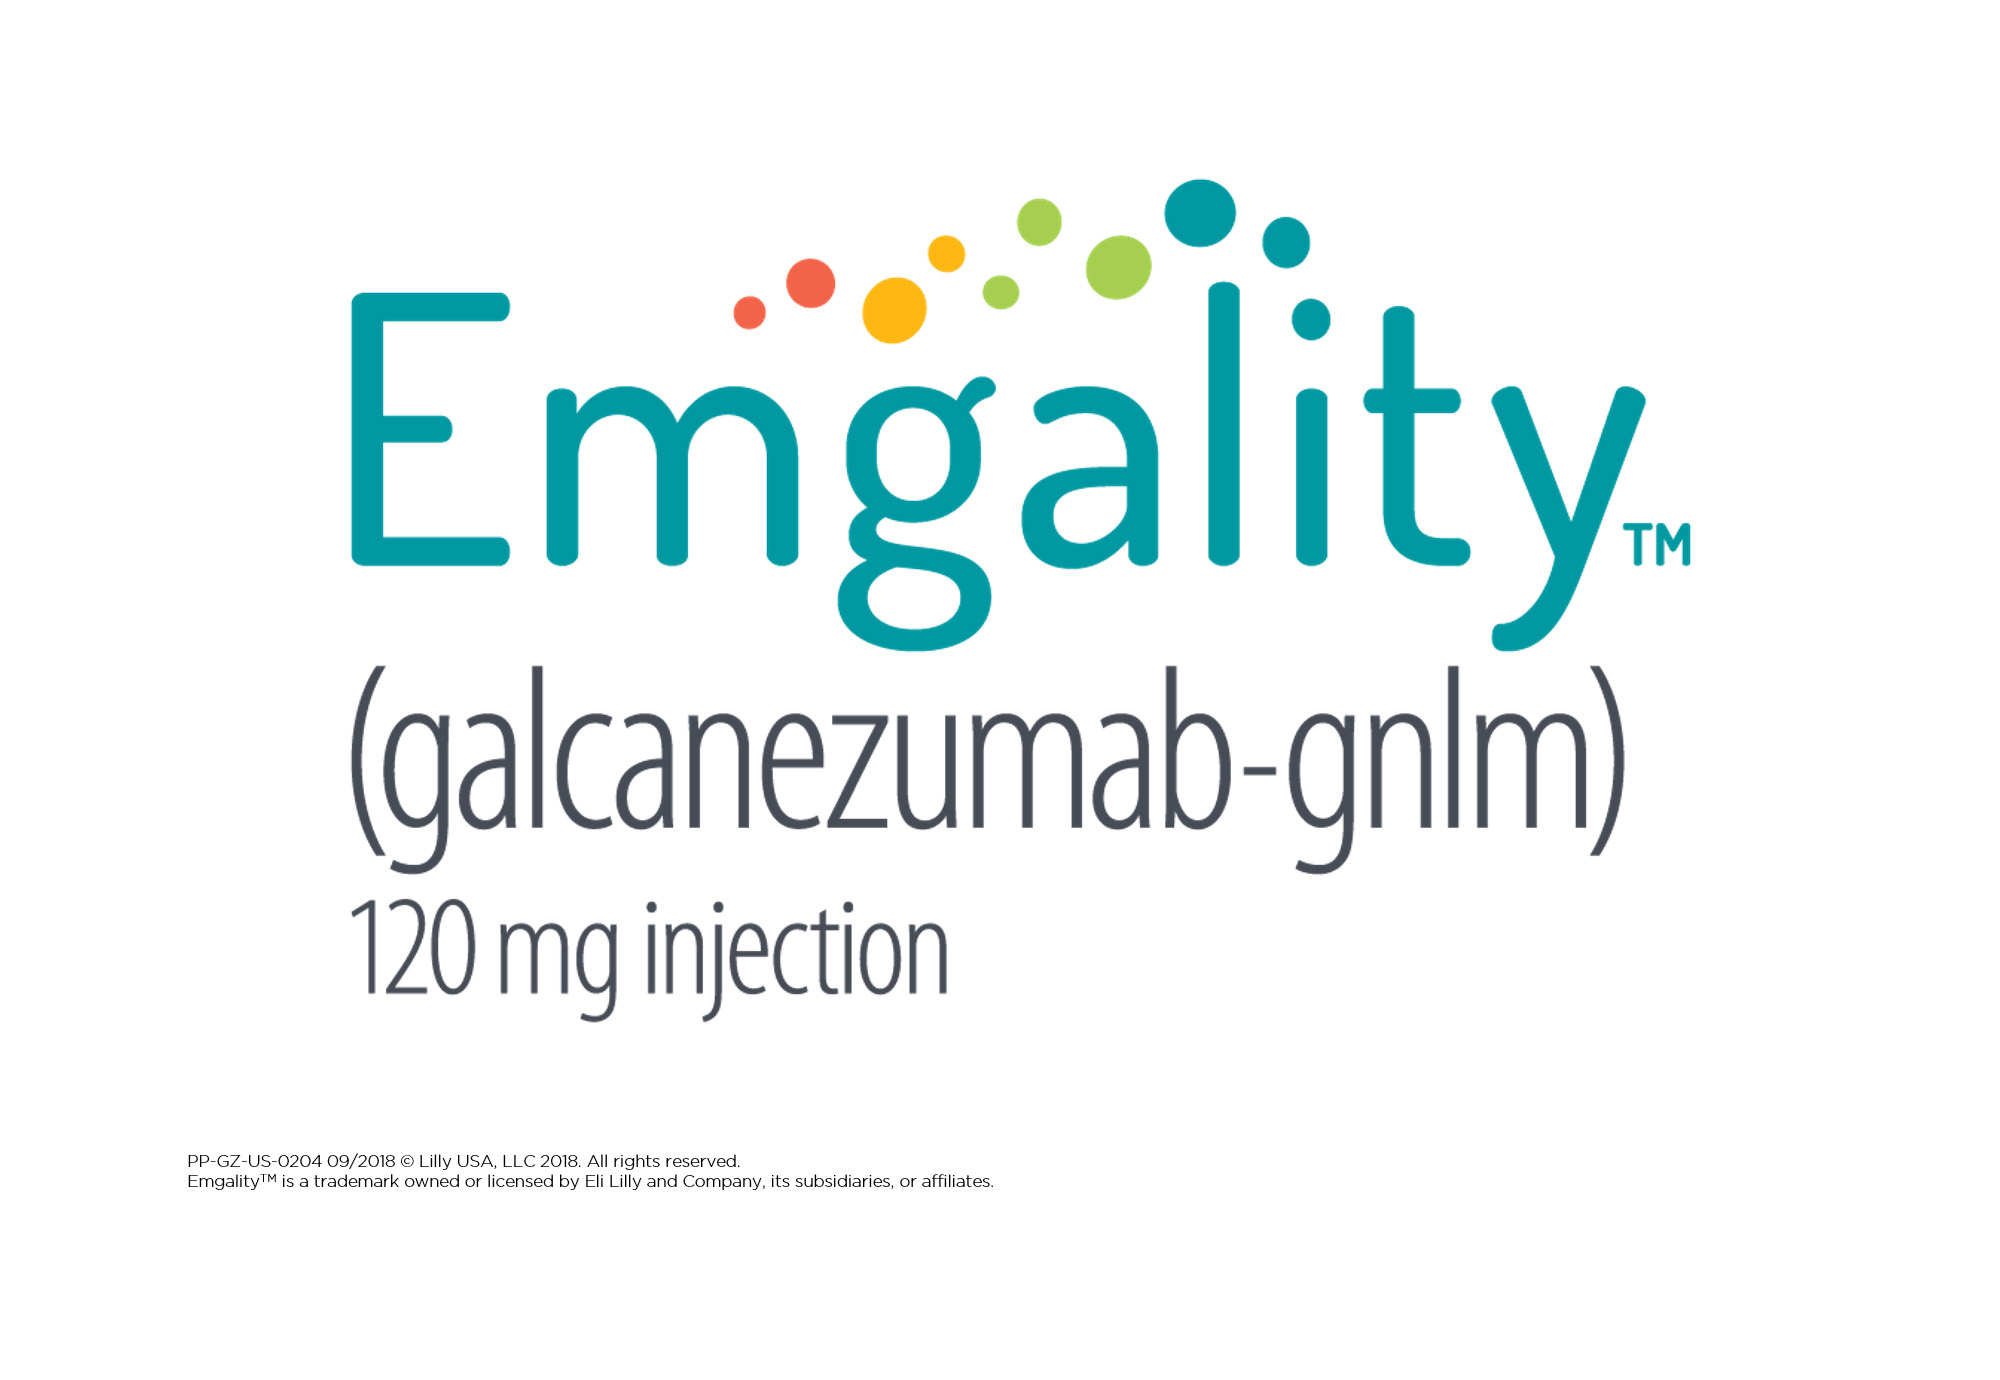 Lilly's Emgality™ (galcanezumab-gnlm) Receives U S  FDA Approval